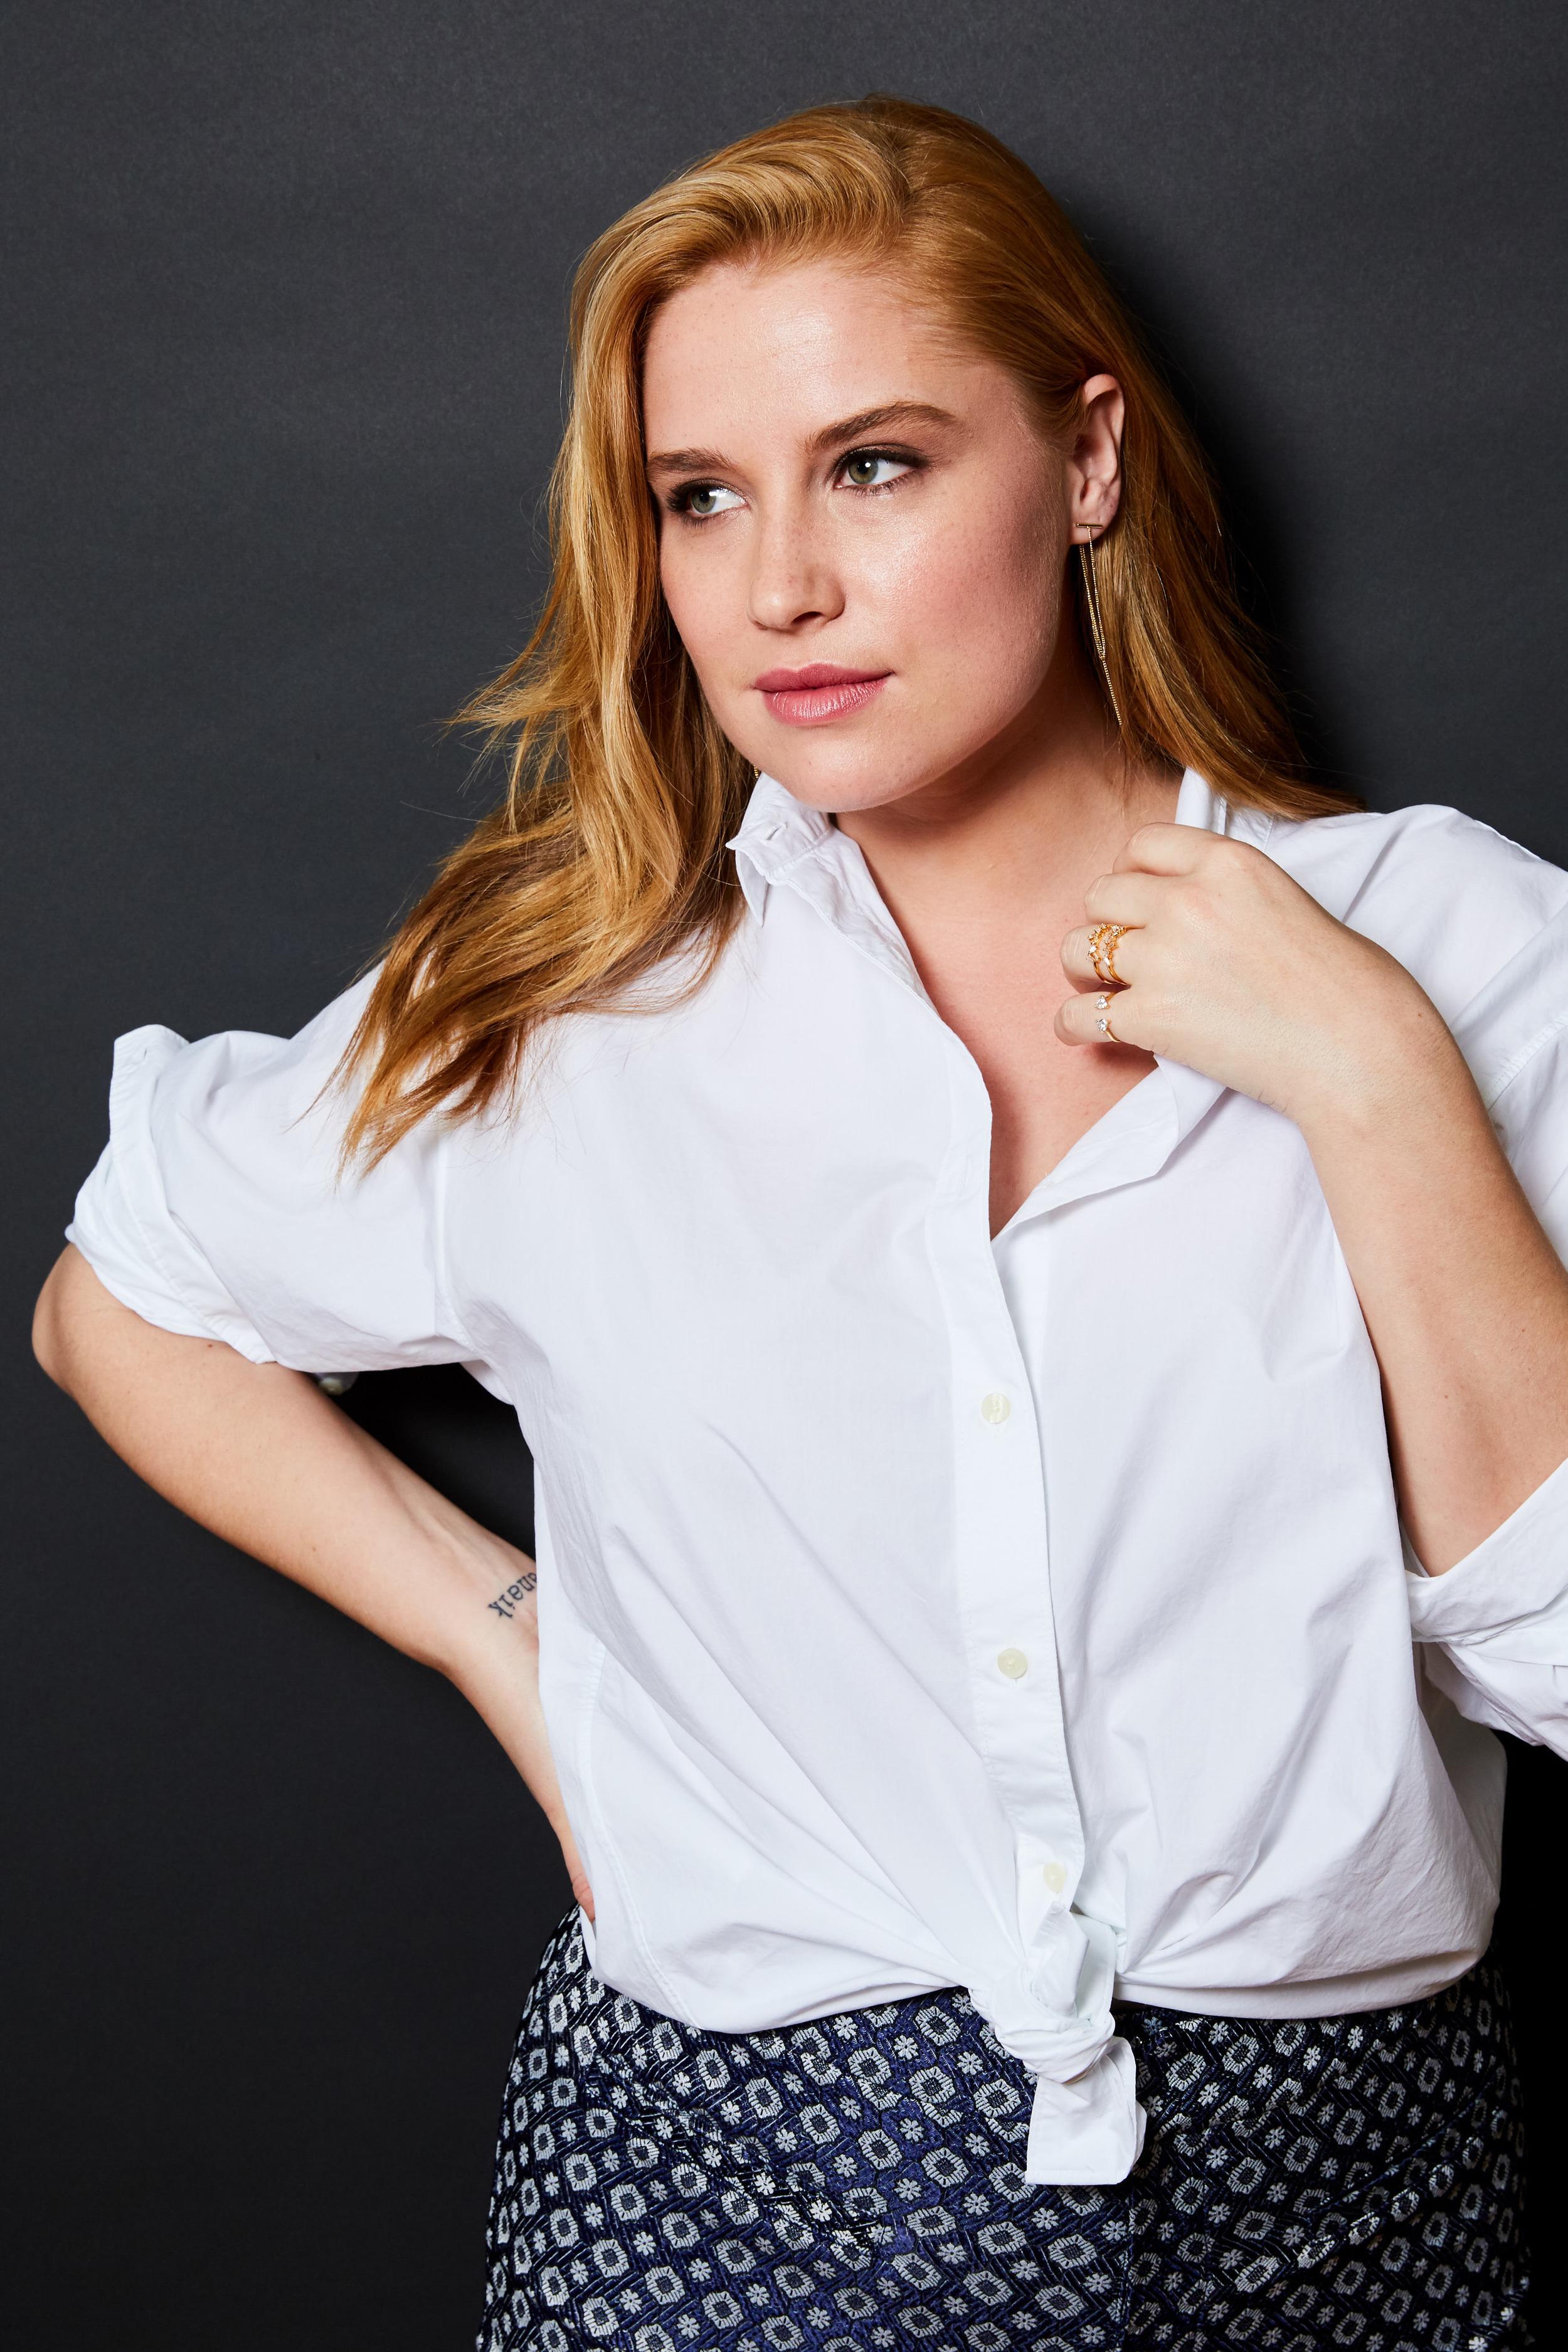 Lands' End shirt, $49;  landsend.com . Rachel Rachel Roy printed pants, $46.99;  macys.com . Jewelry Storm drop earrings, $36;  jewelrystorm.com . MeMe London rings, $75 each;  meme.london .